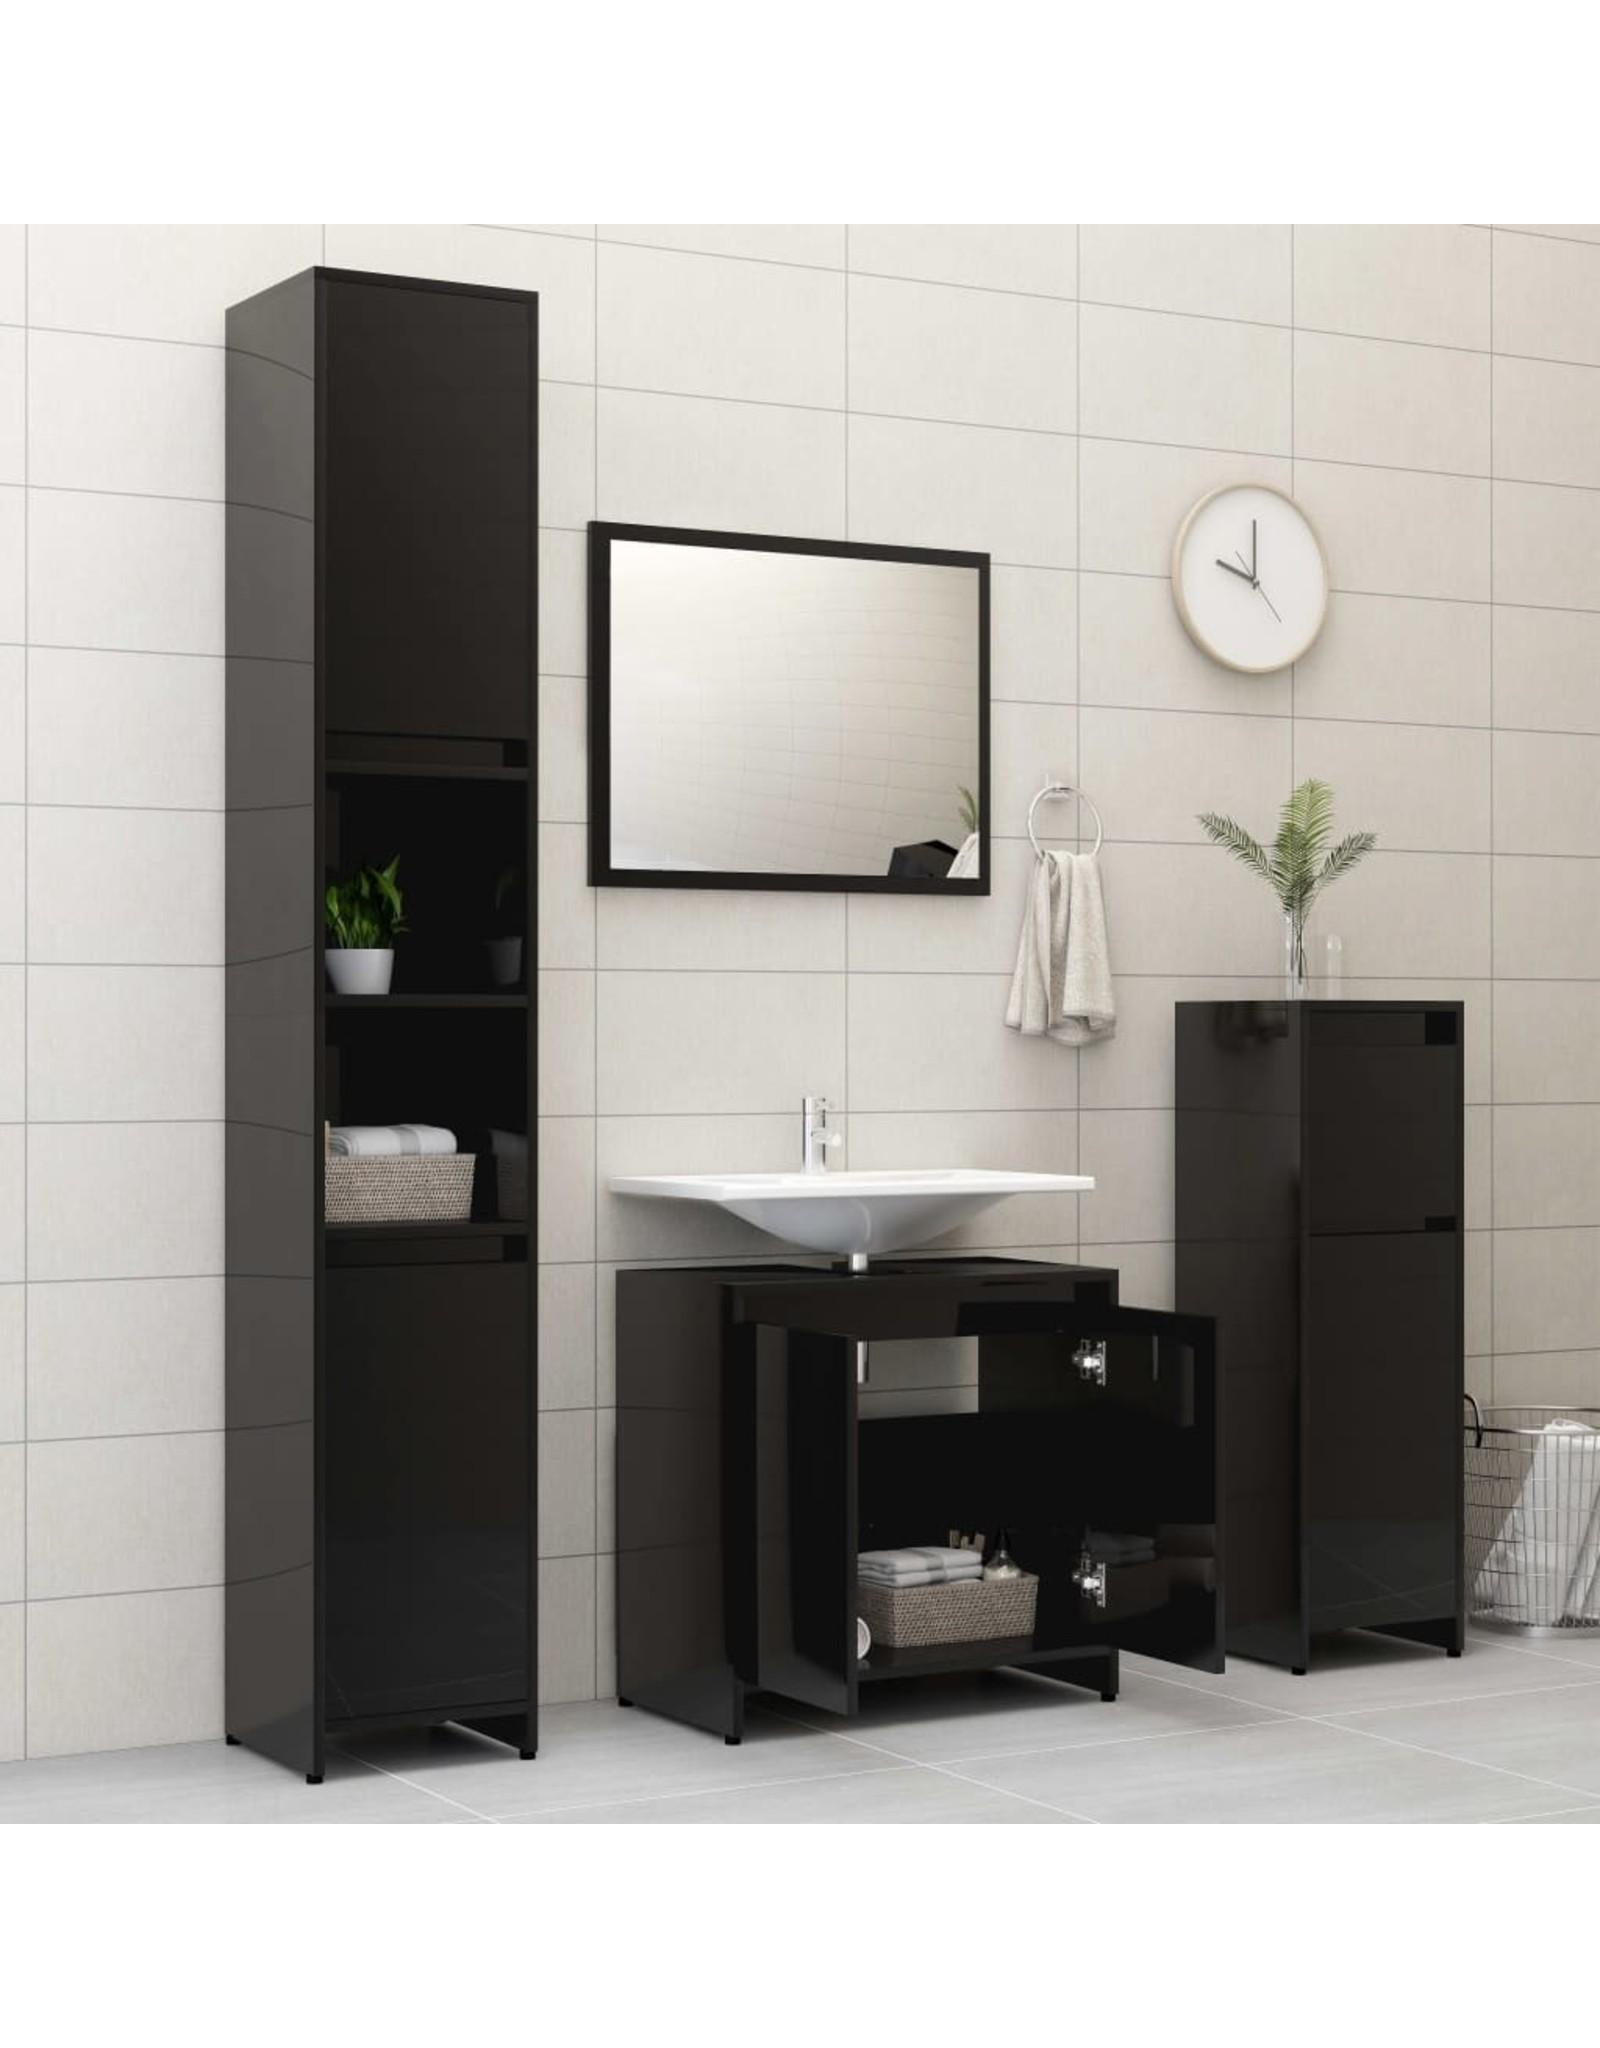 Badkamermeubelset spaanplaat hoogglans zwart